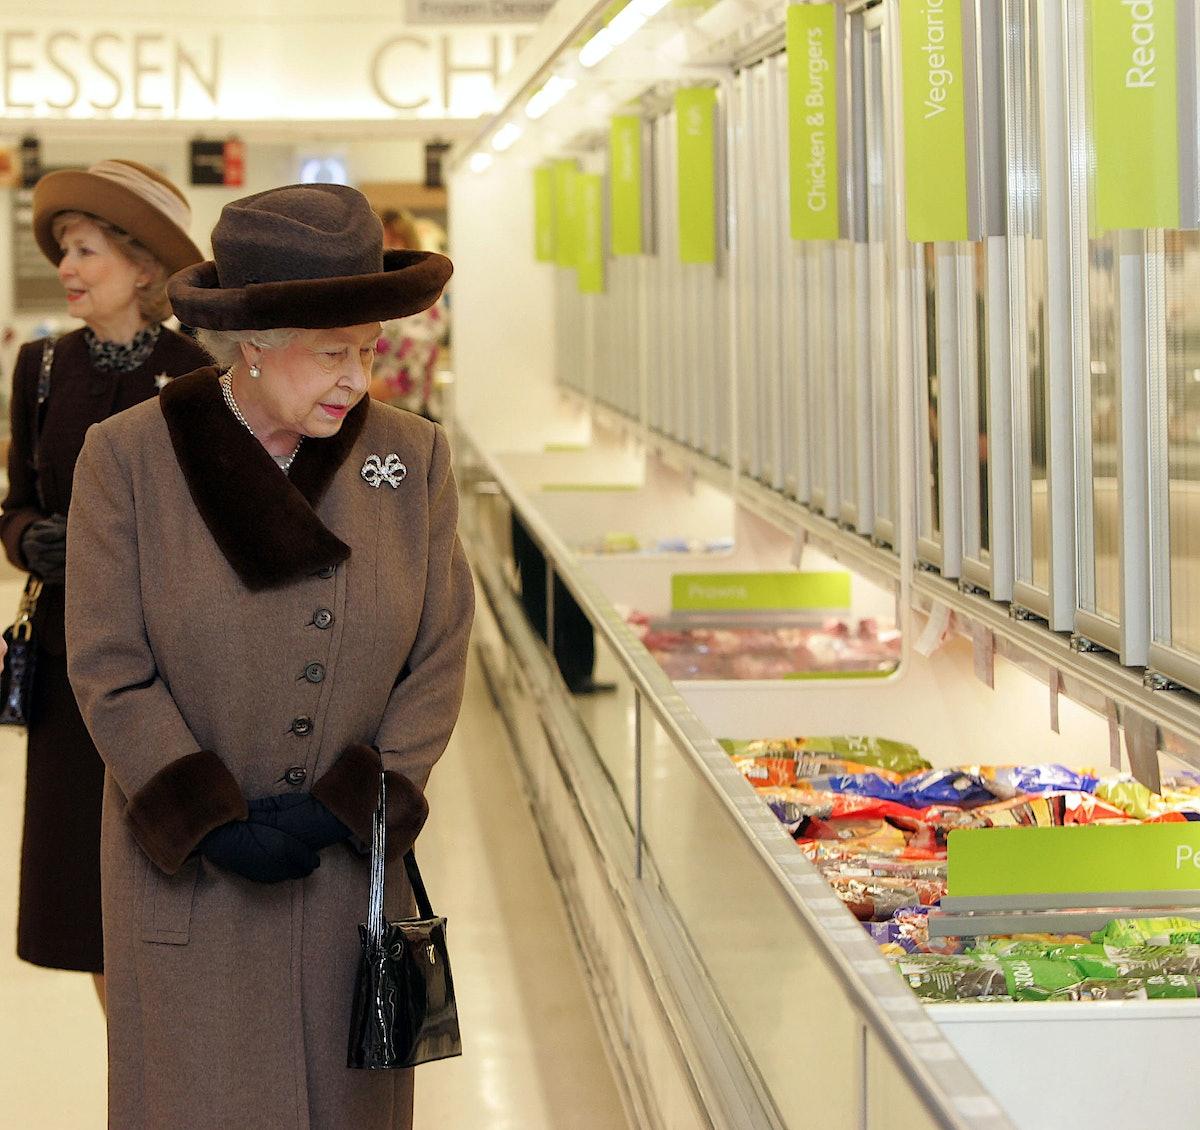 Queen Elizabeth II At King Edward Court Shopping Centre